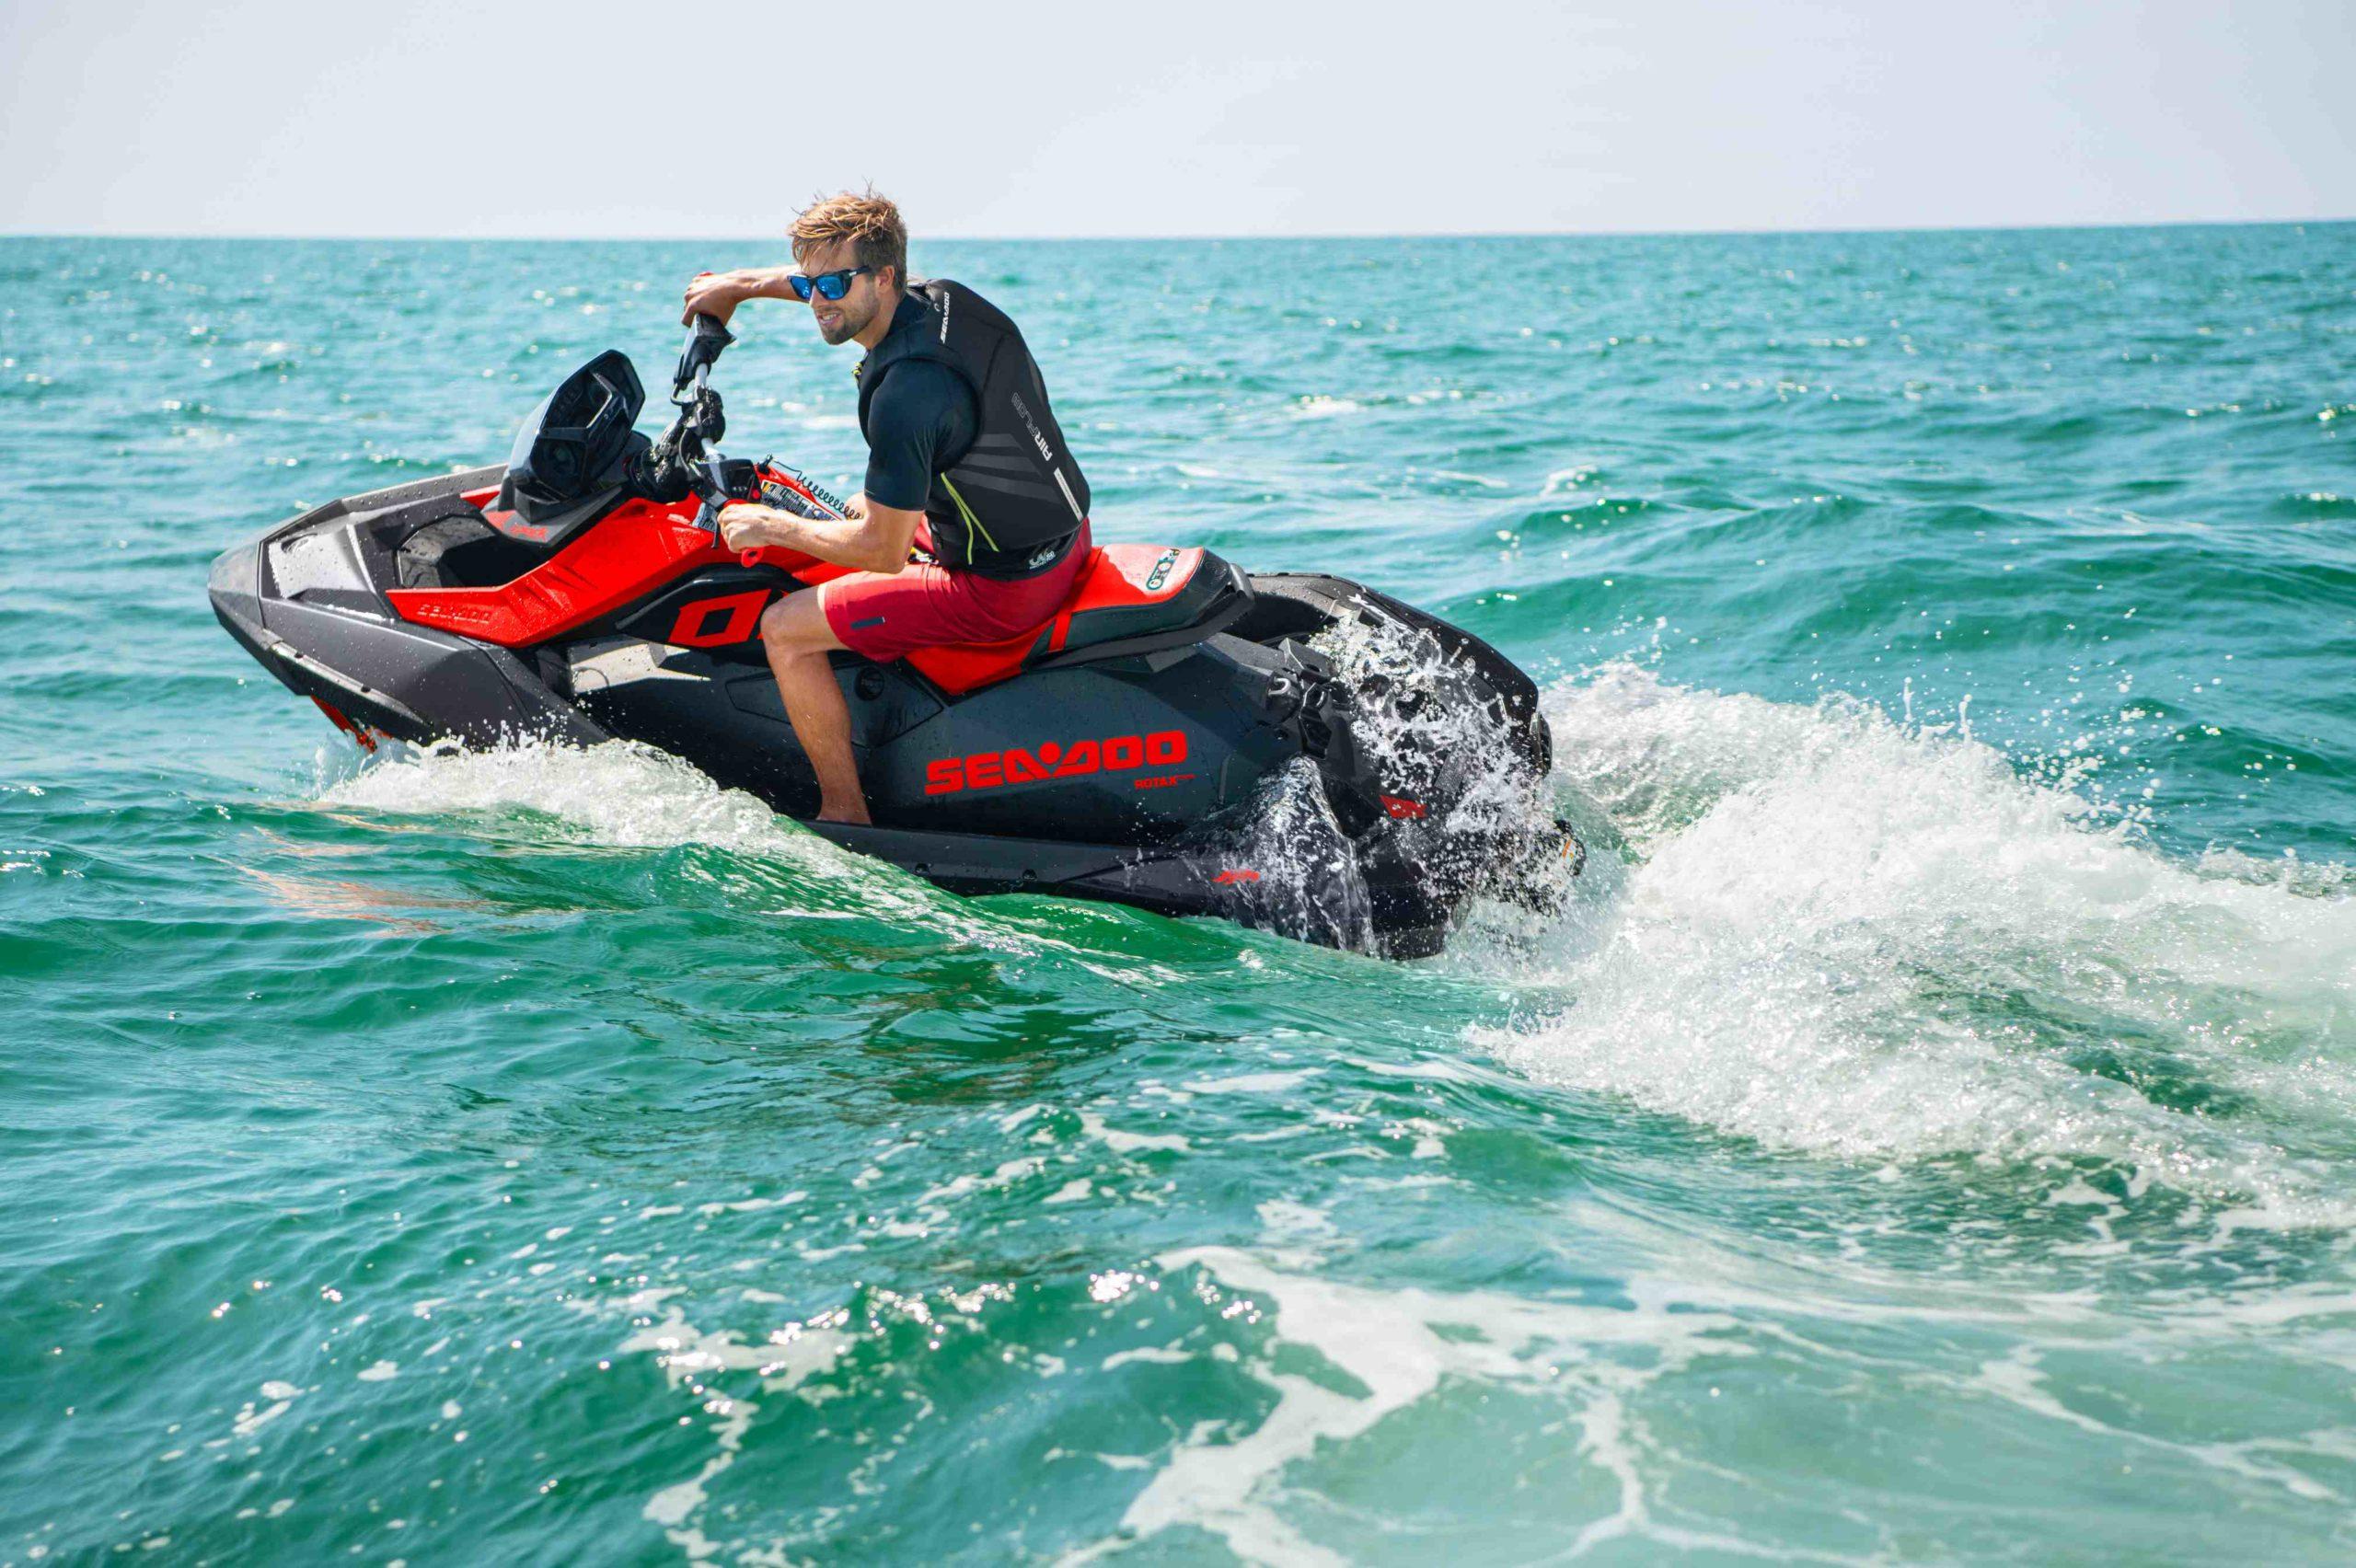 SEA-MY21-Spark-Trixx-action-DB-0285-RGB